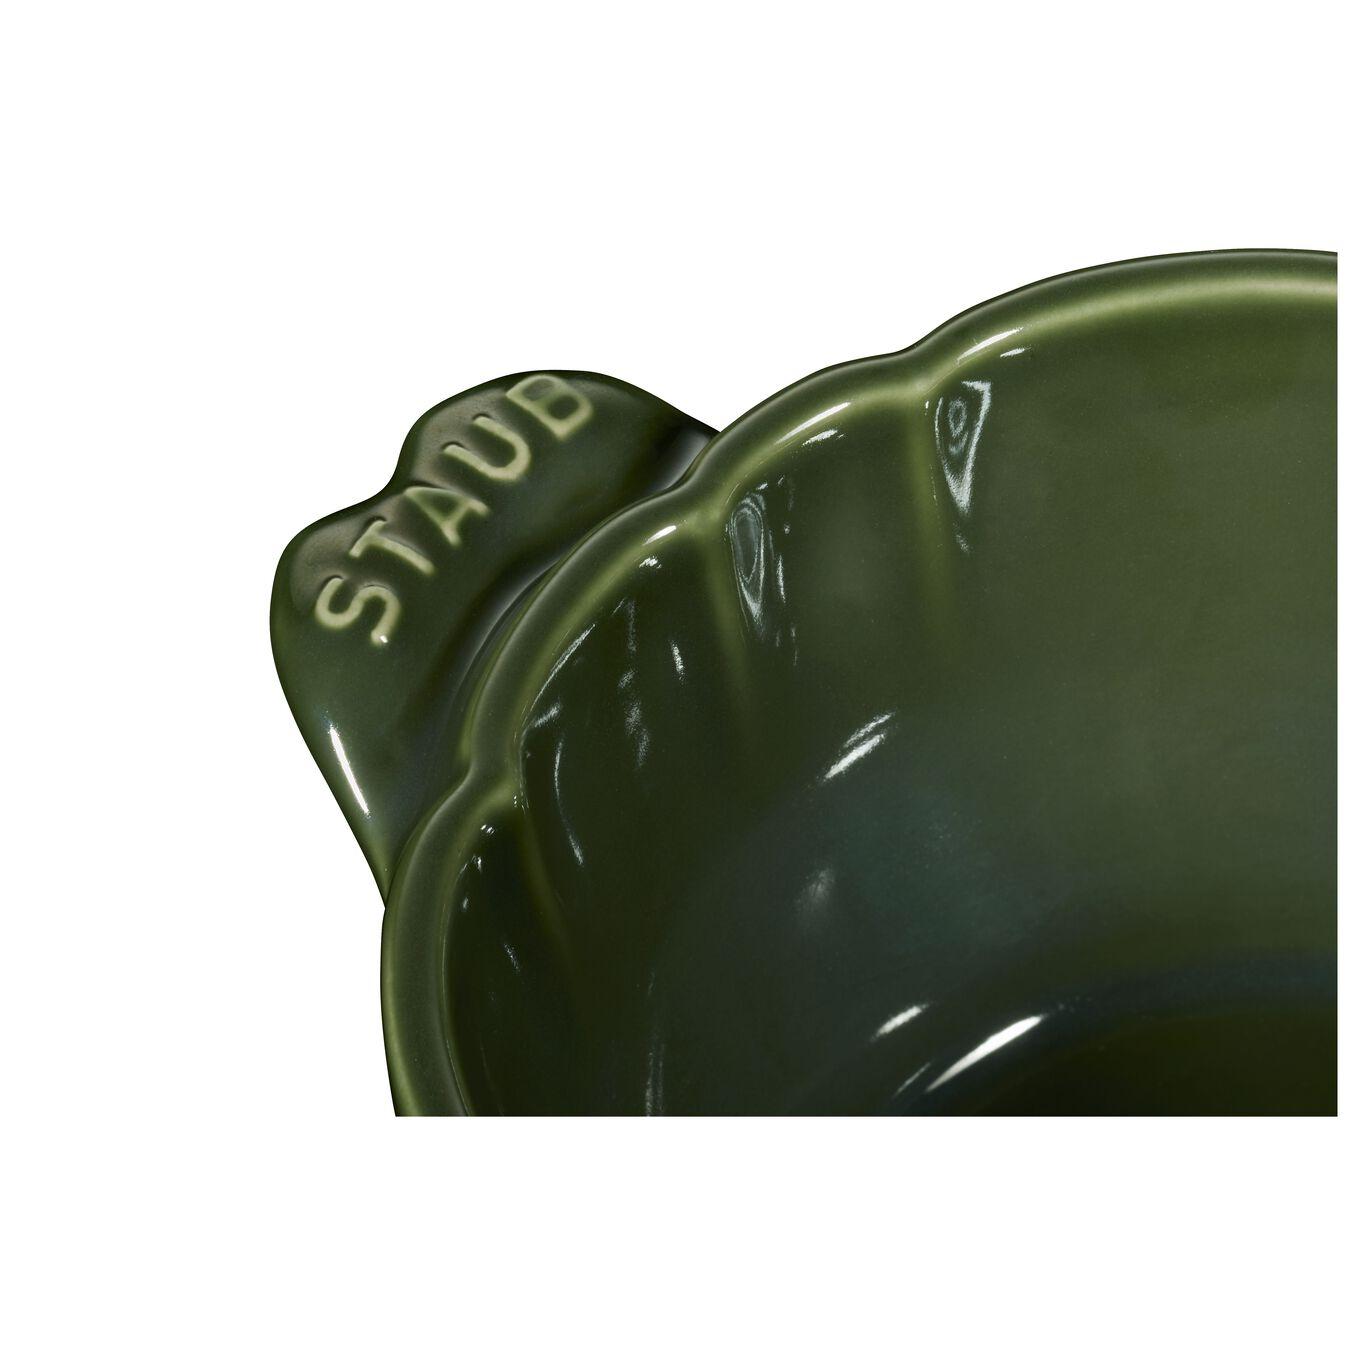 Cocotte 13 cm, Artischocke, Basilikum-Grün, Keramik,,large 3